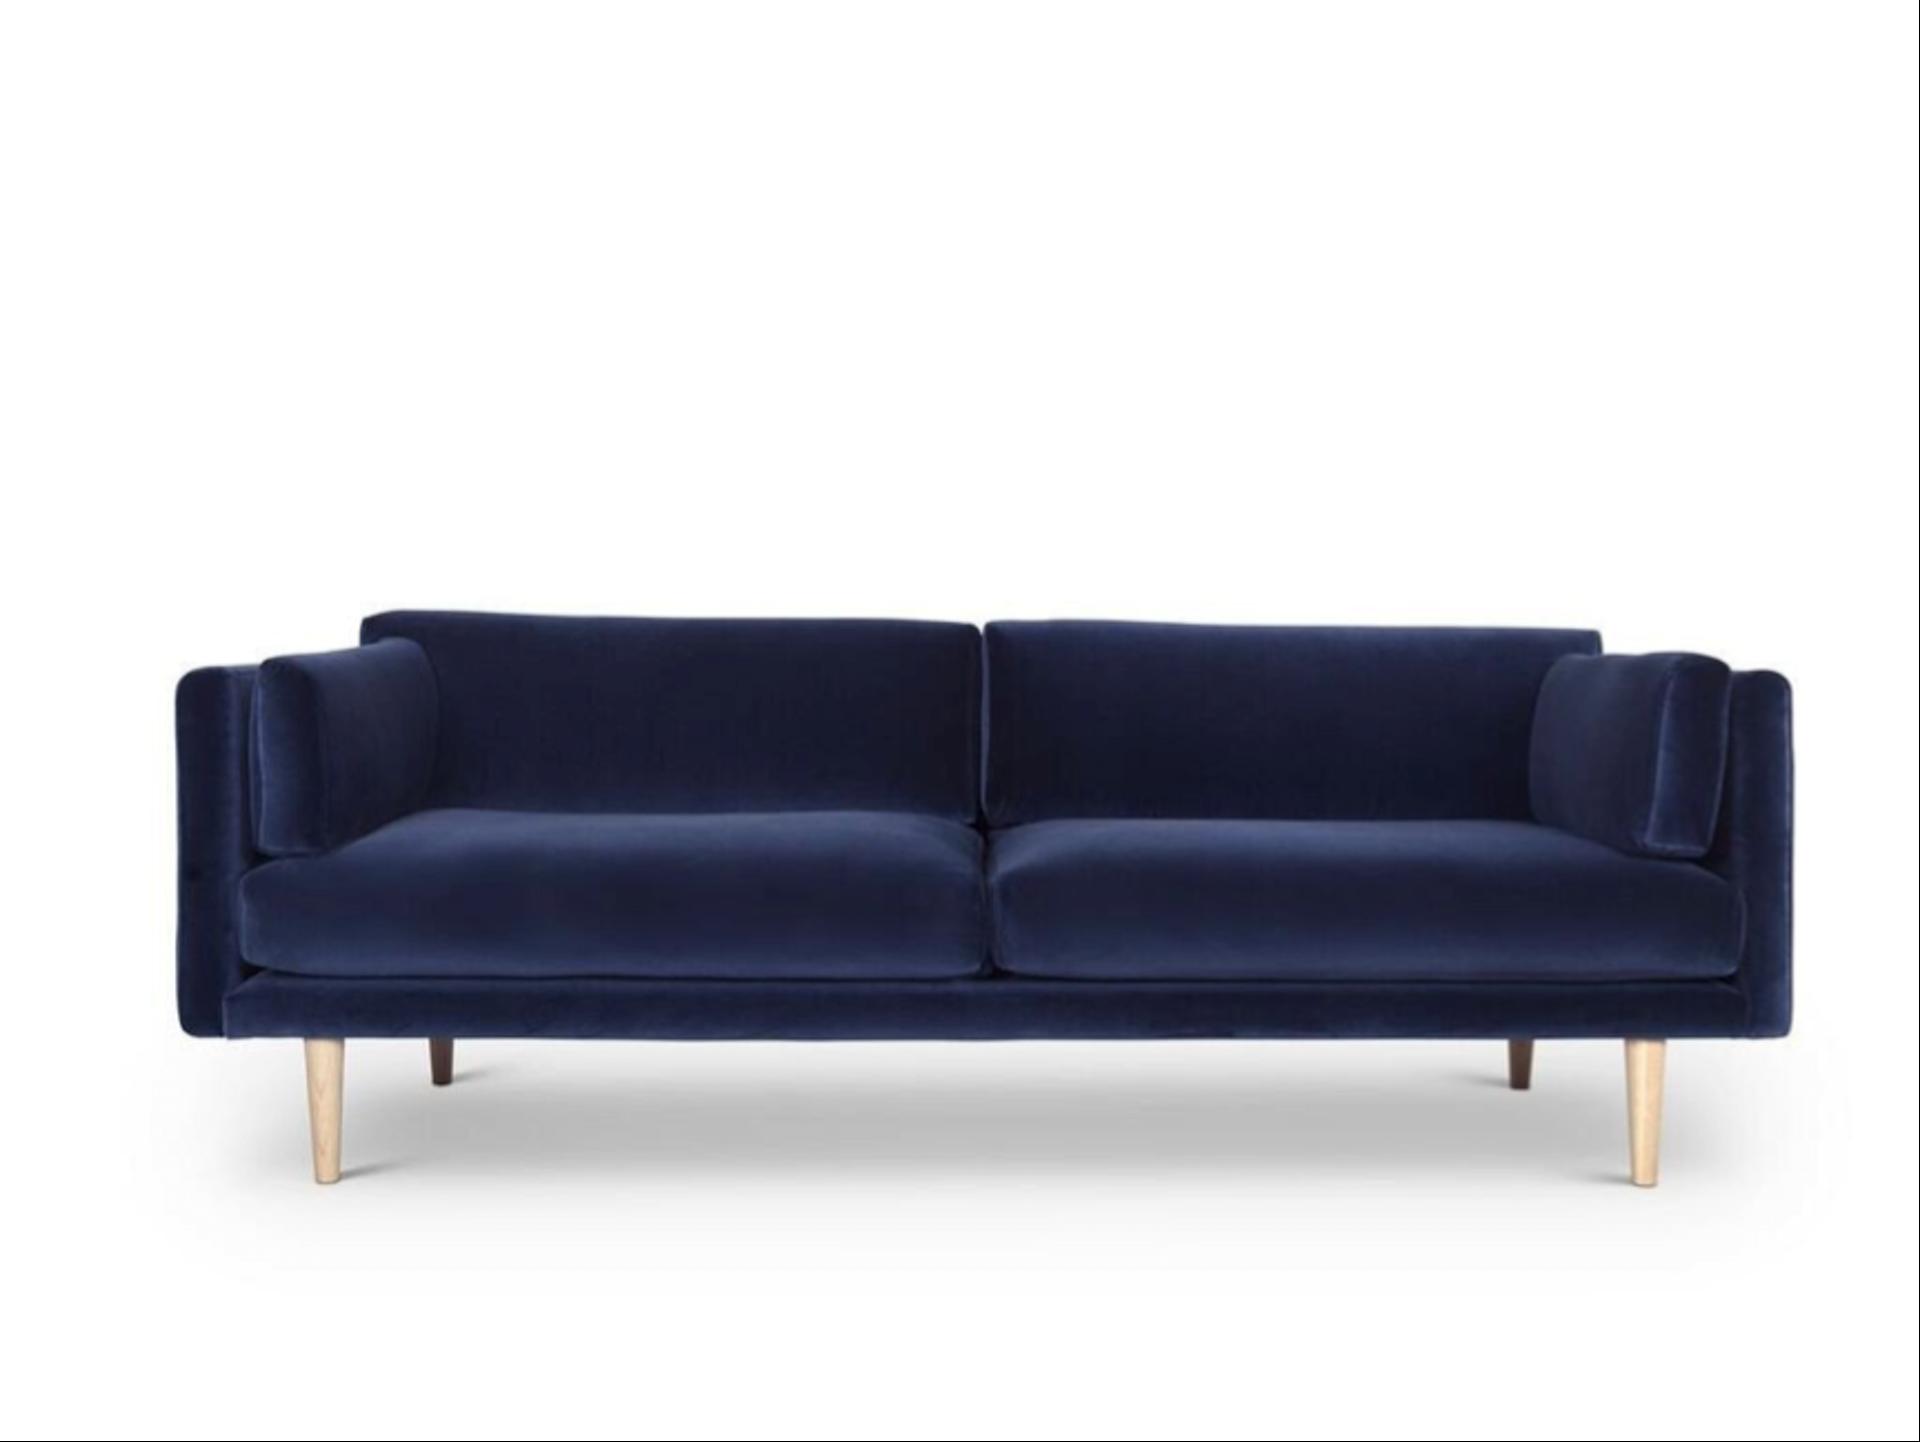 Genial Sofa Velour Ideen Von Mørkeblå Af Sigurd Larsen